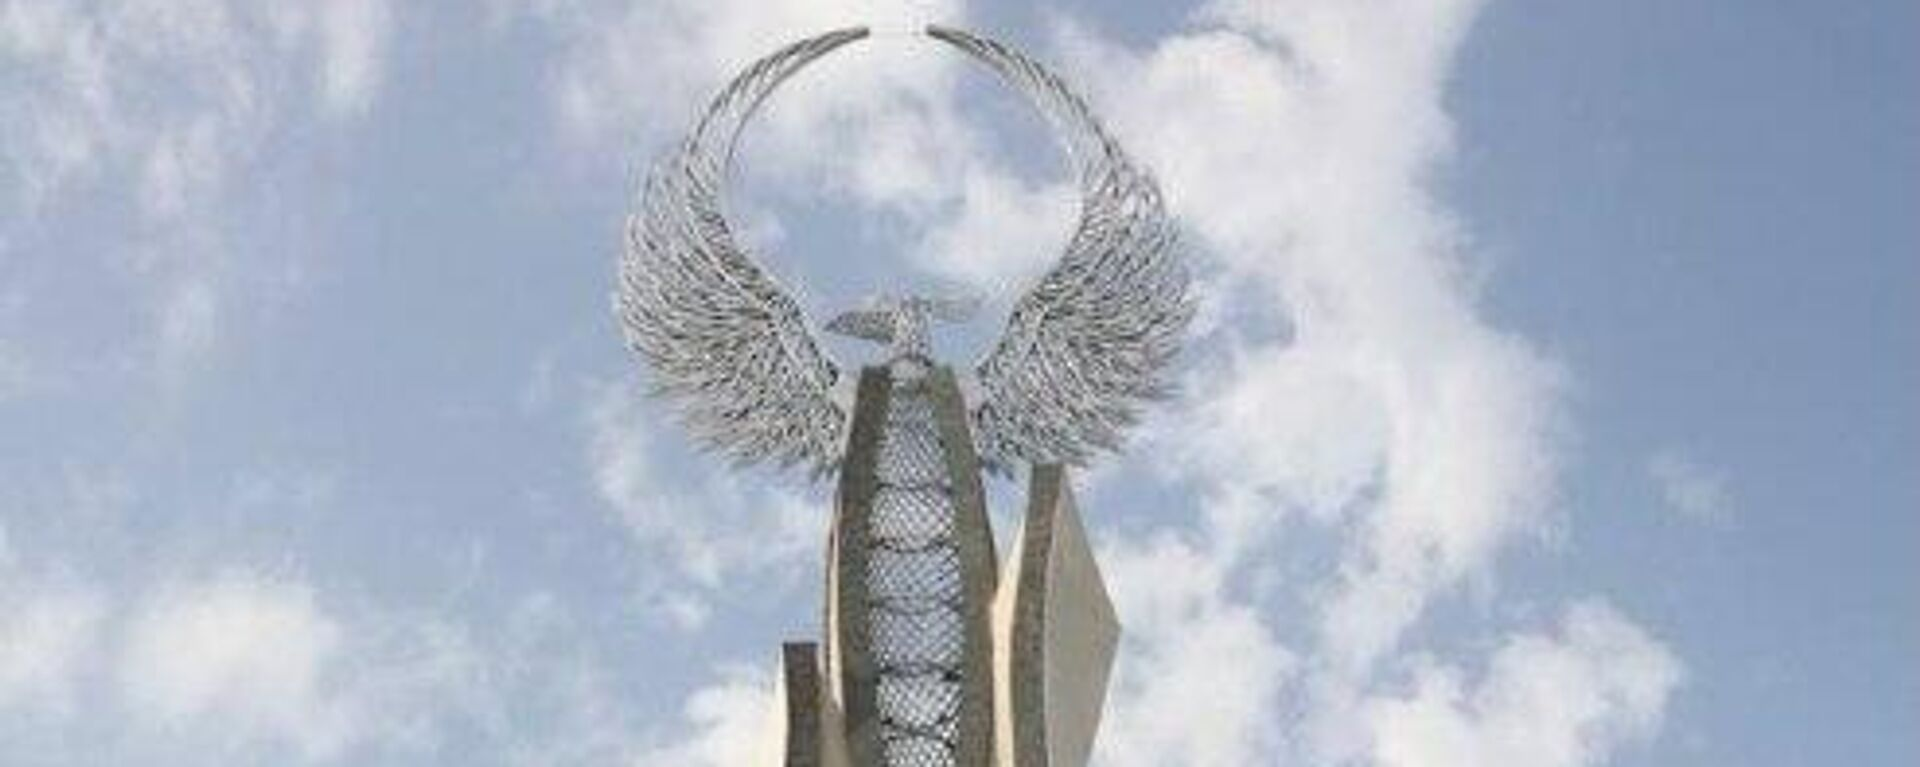 Монумент Независимости в Ташкенте - Sputnik Узбекистан, 1920, 01.09.2021